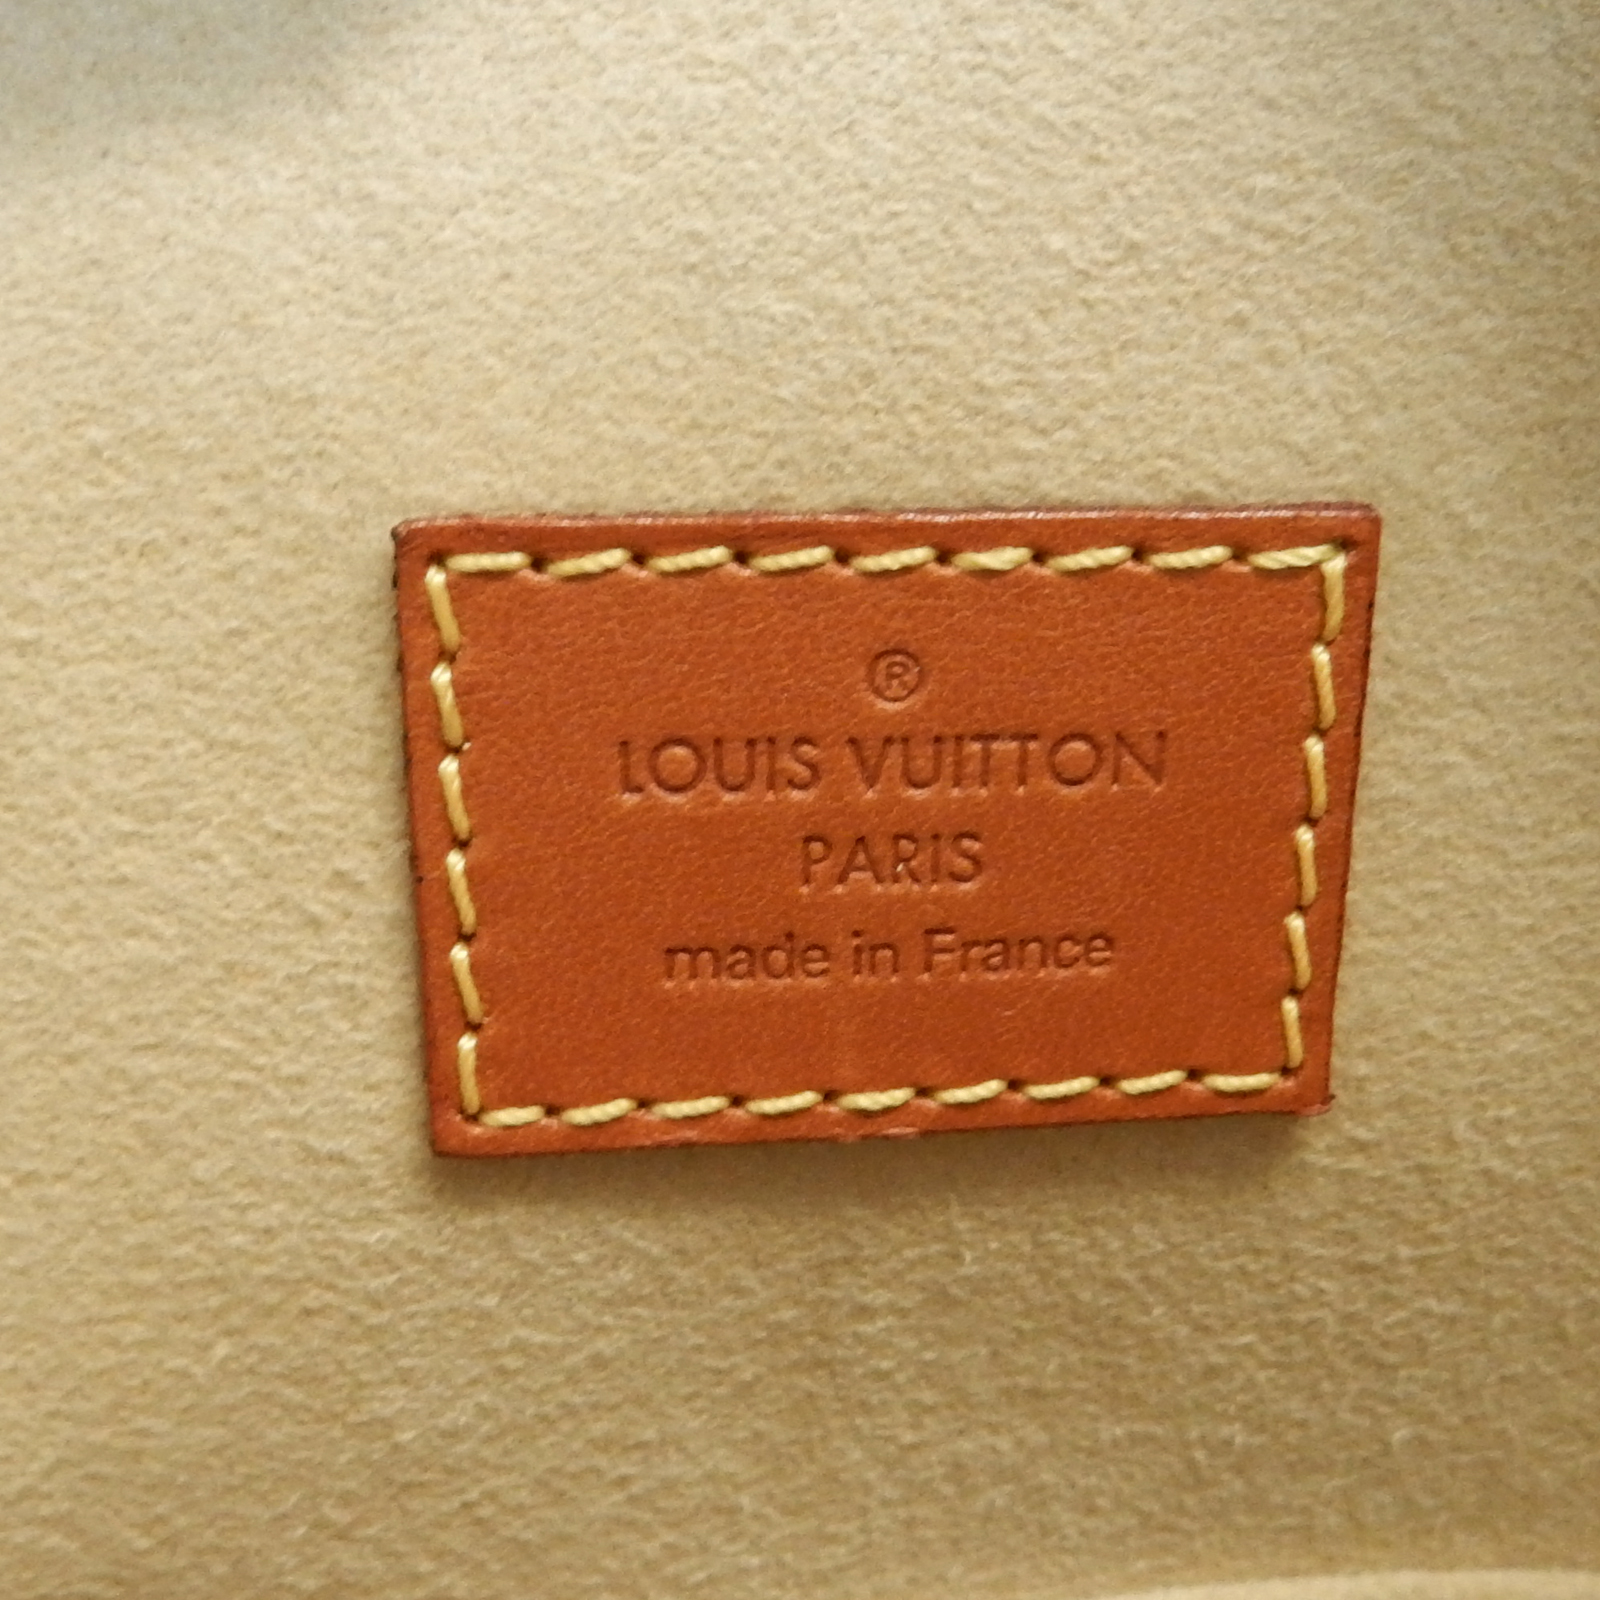 Rise-on LOUIS VUITTON Nomade Leather Lockit Caramel Brown Handbag ... c0f43fa71158e